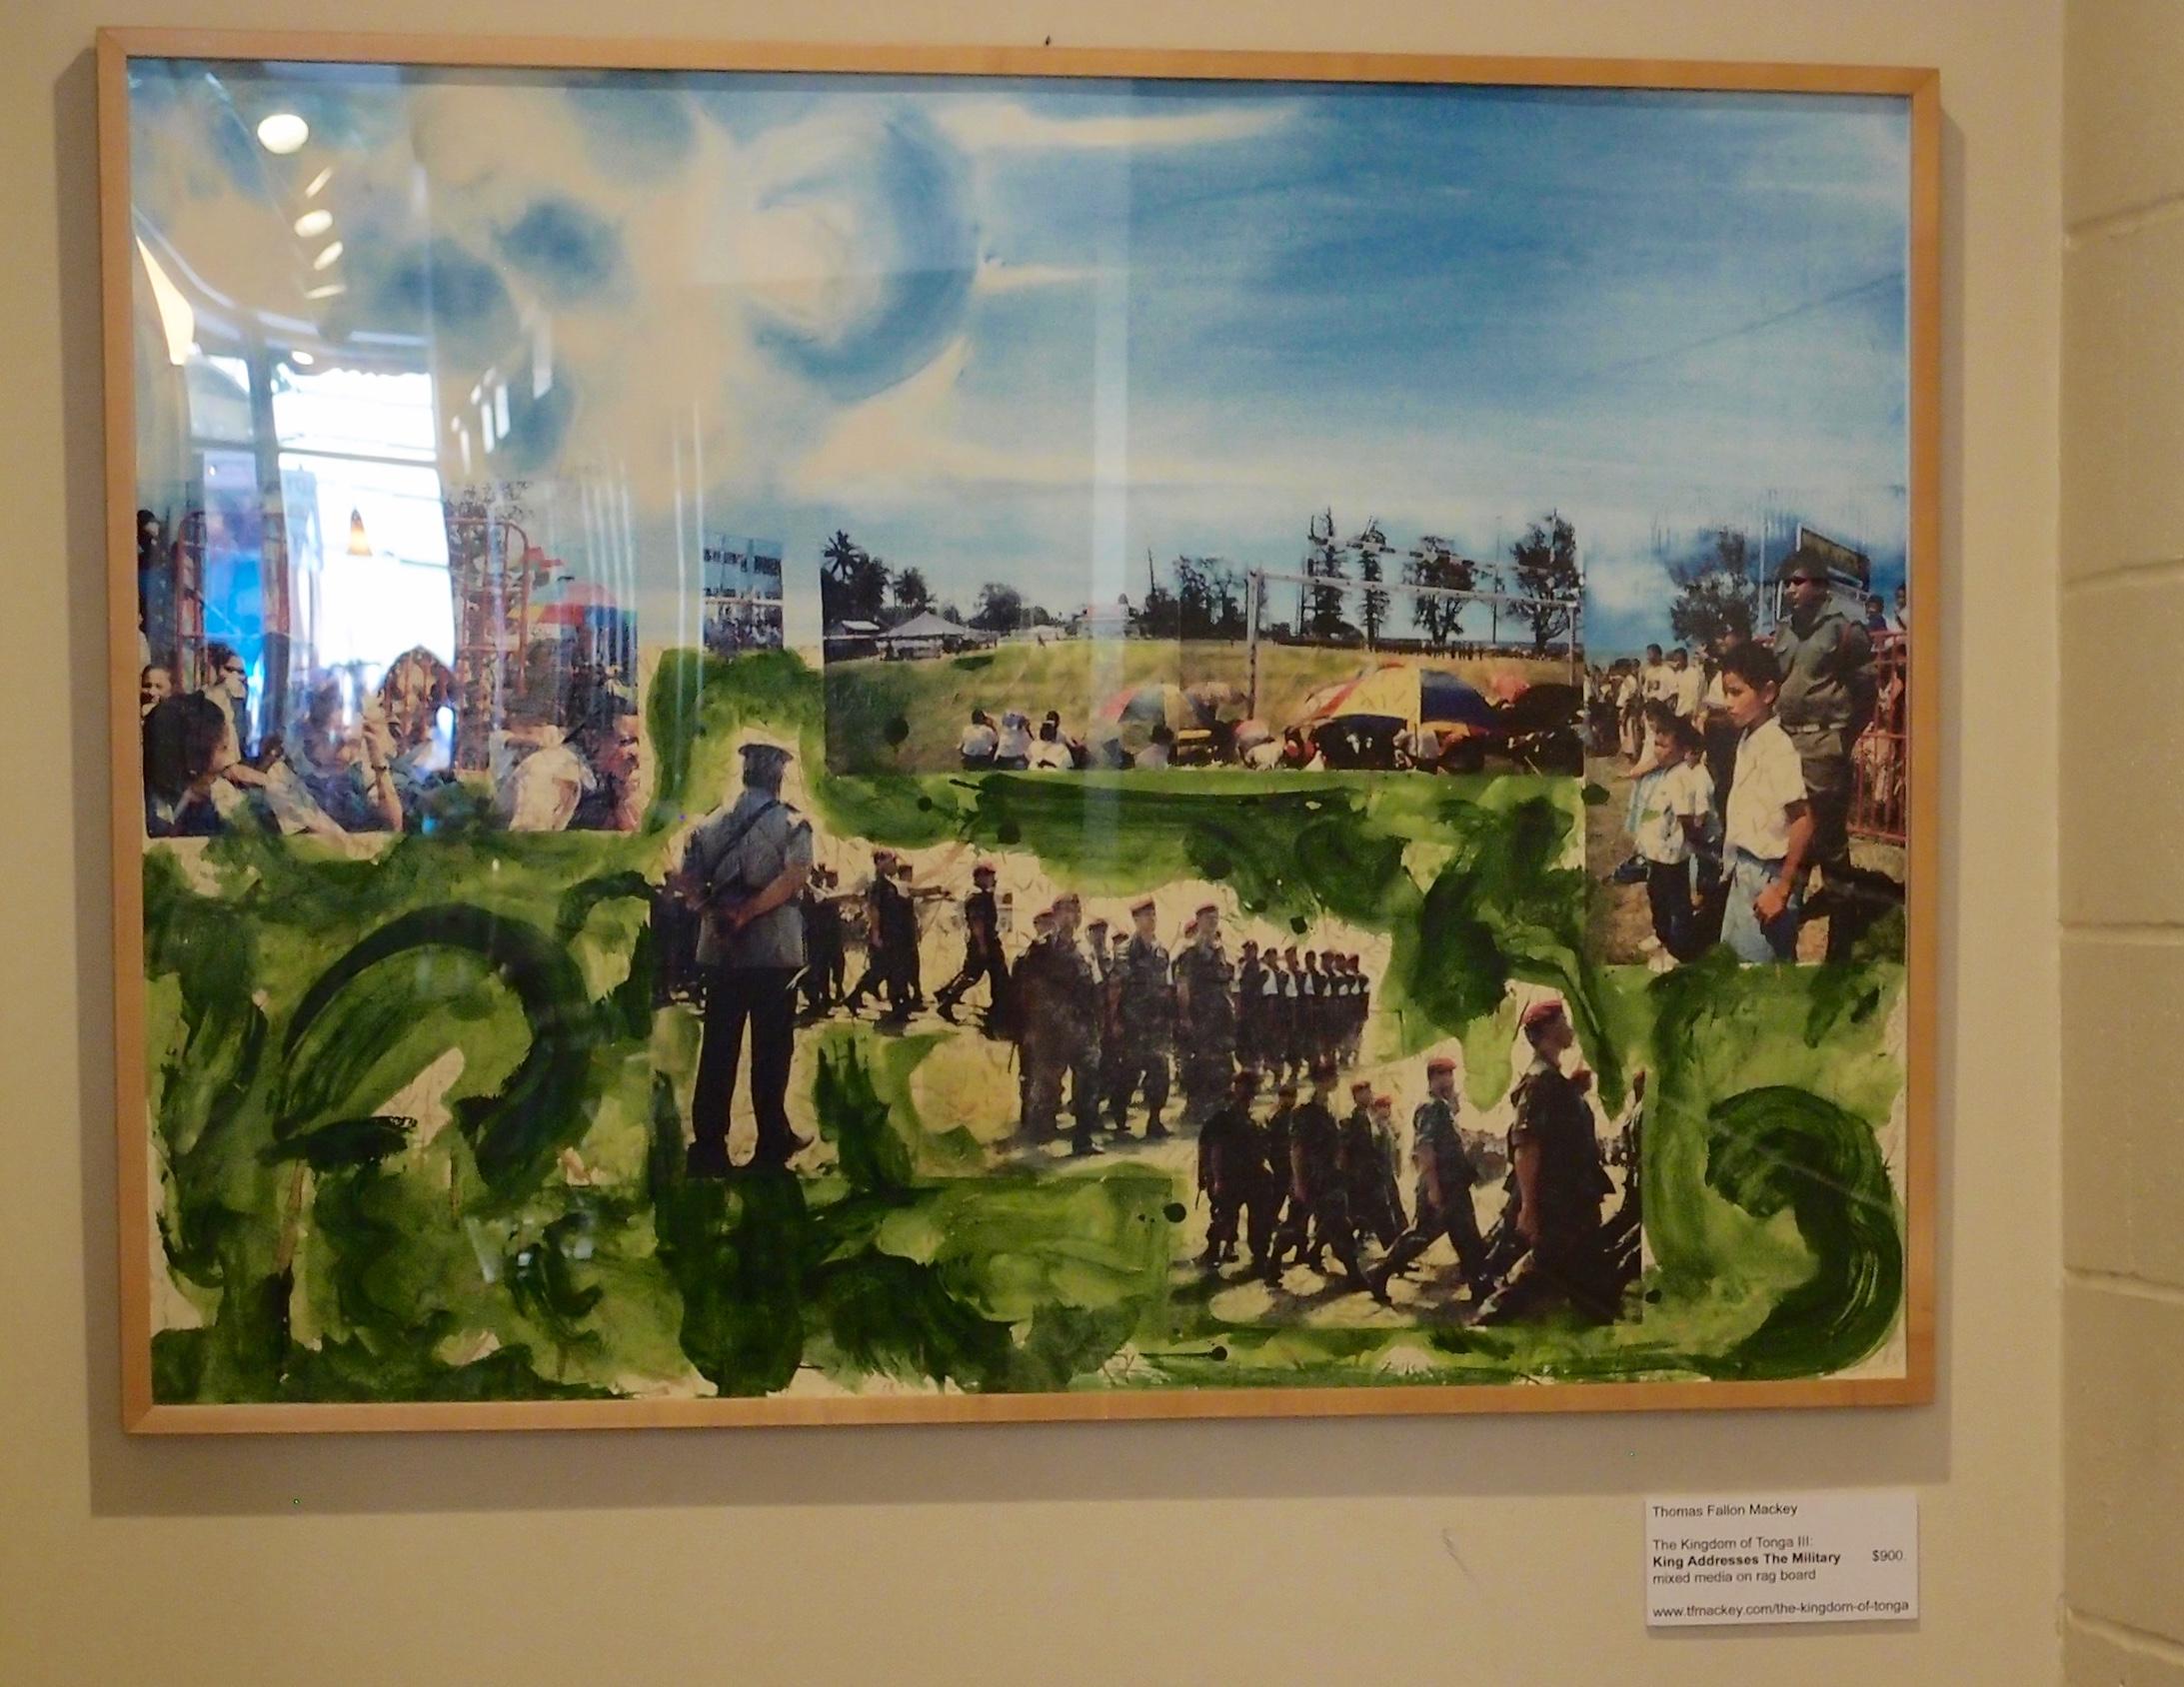 "The Kingdom of Tonga III: The King Addresses The Military mixed media on rag board (31 x 41"")"